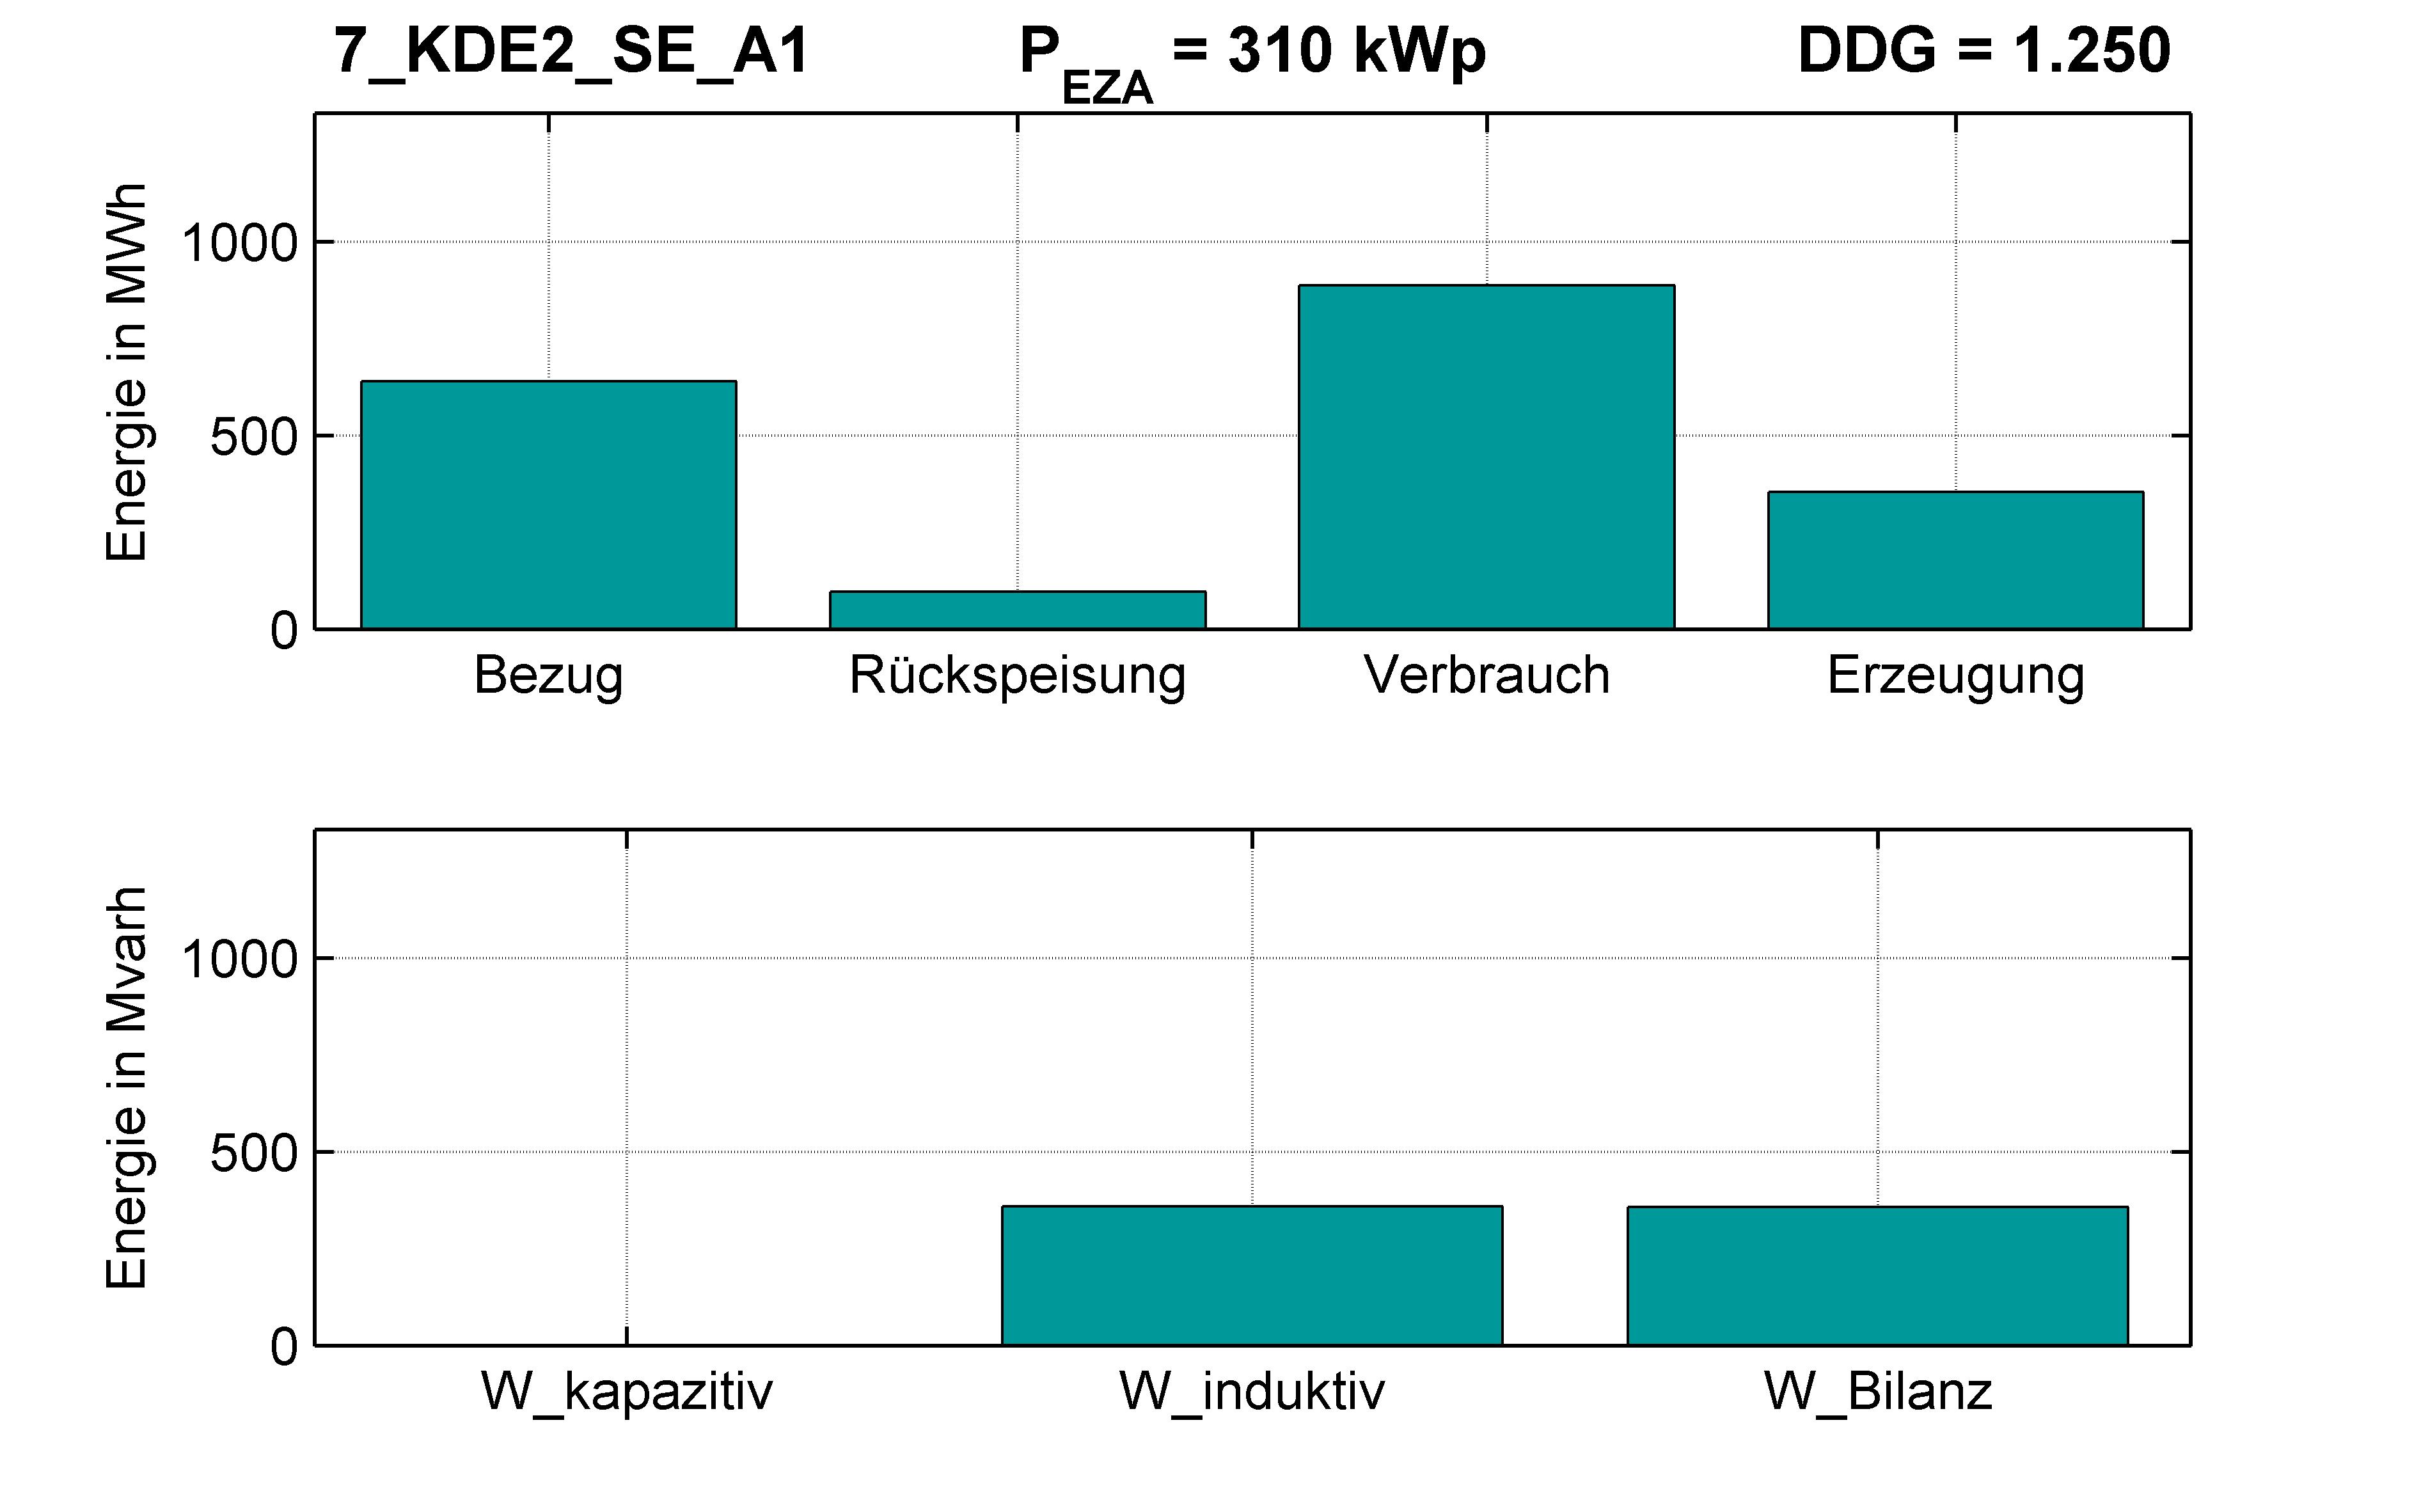 KDE2 | Längsregler (SE) A1 | PQ-Bilanz